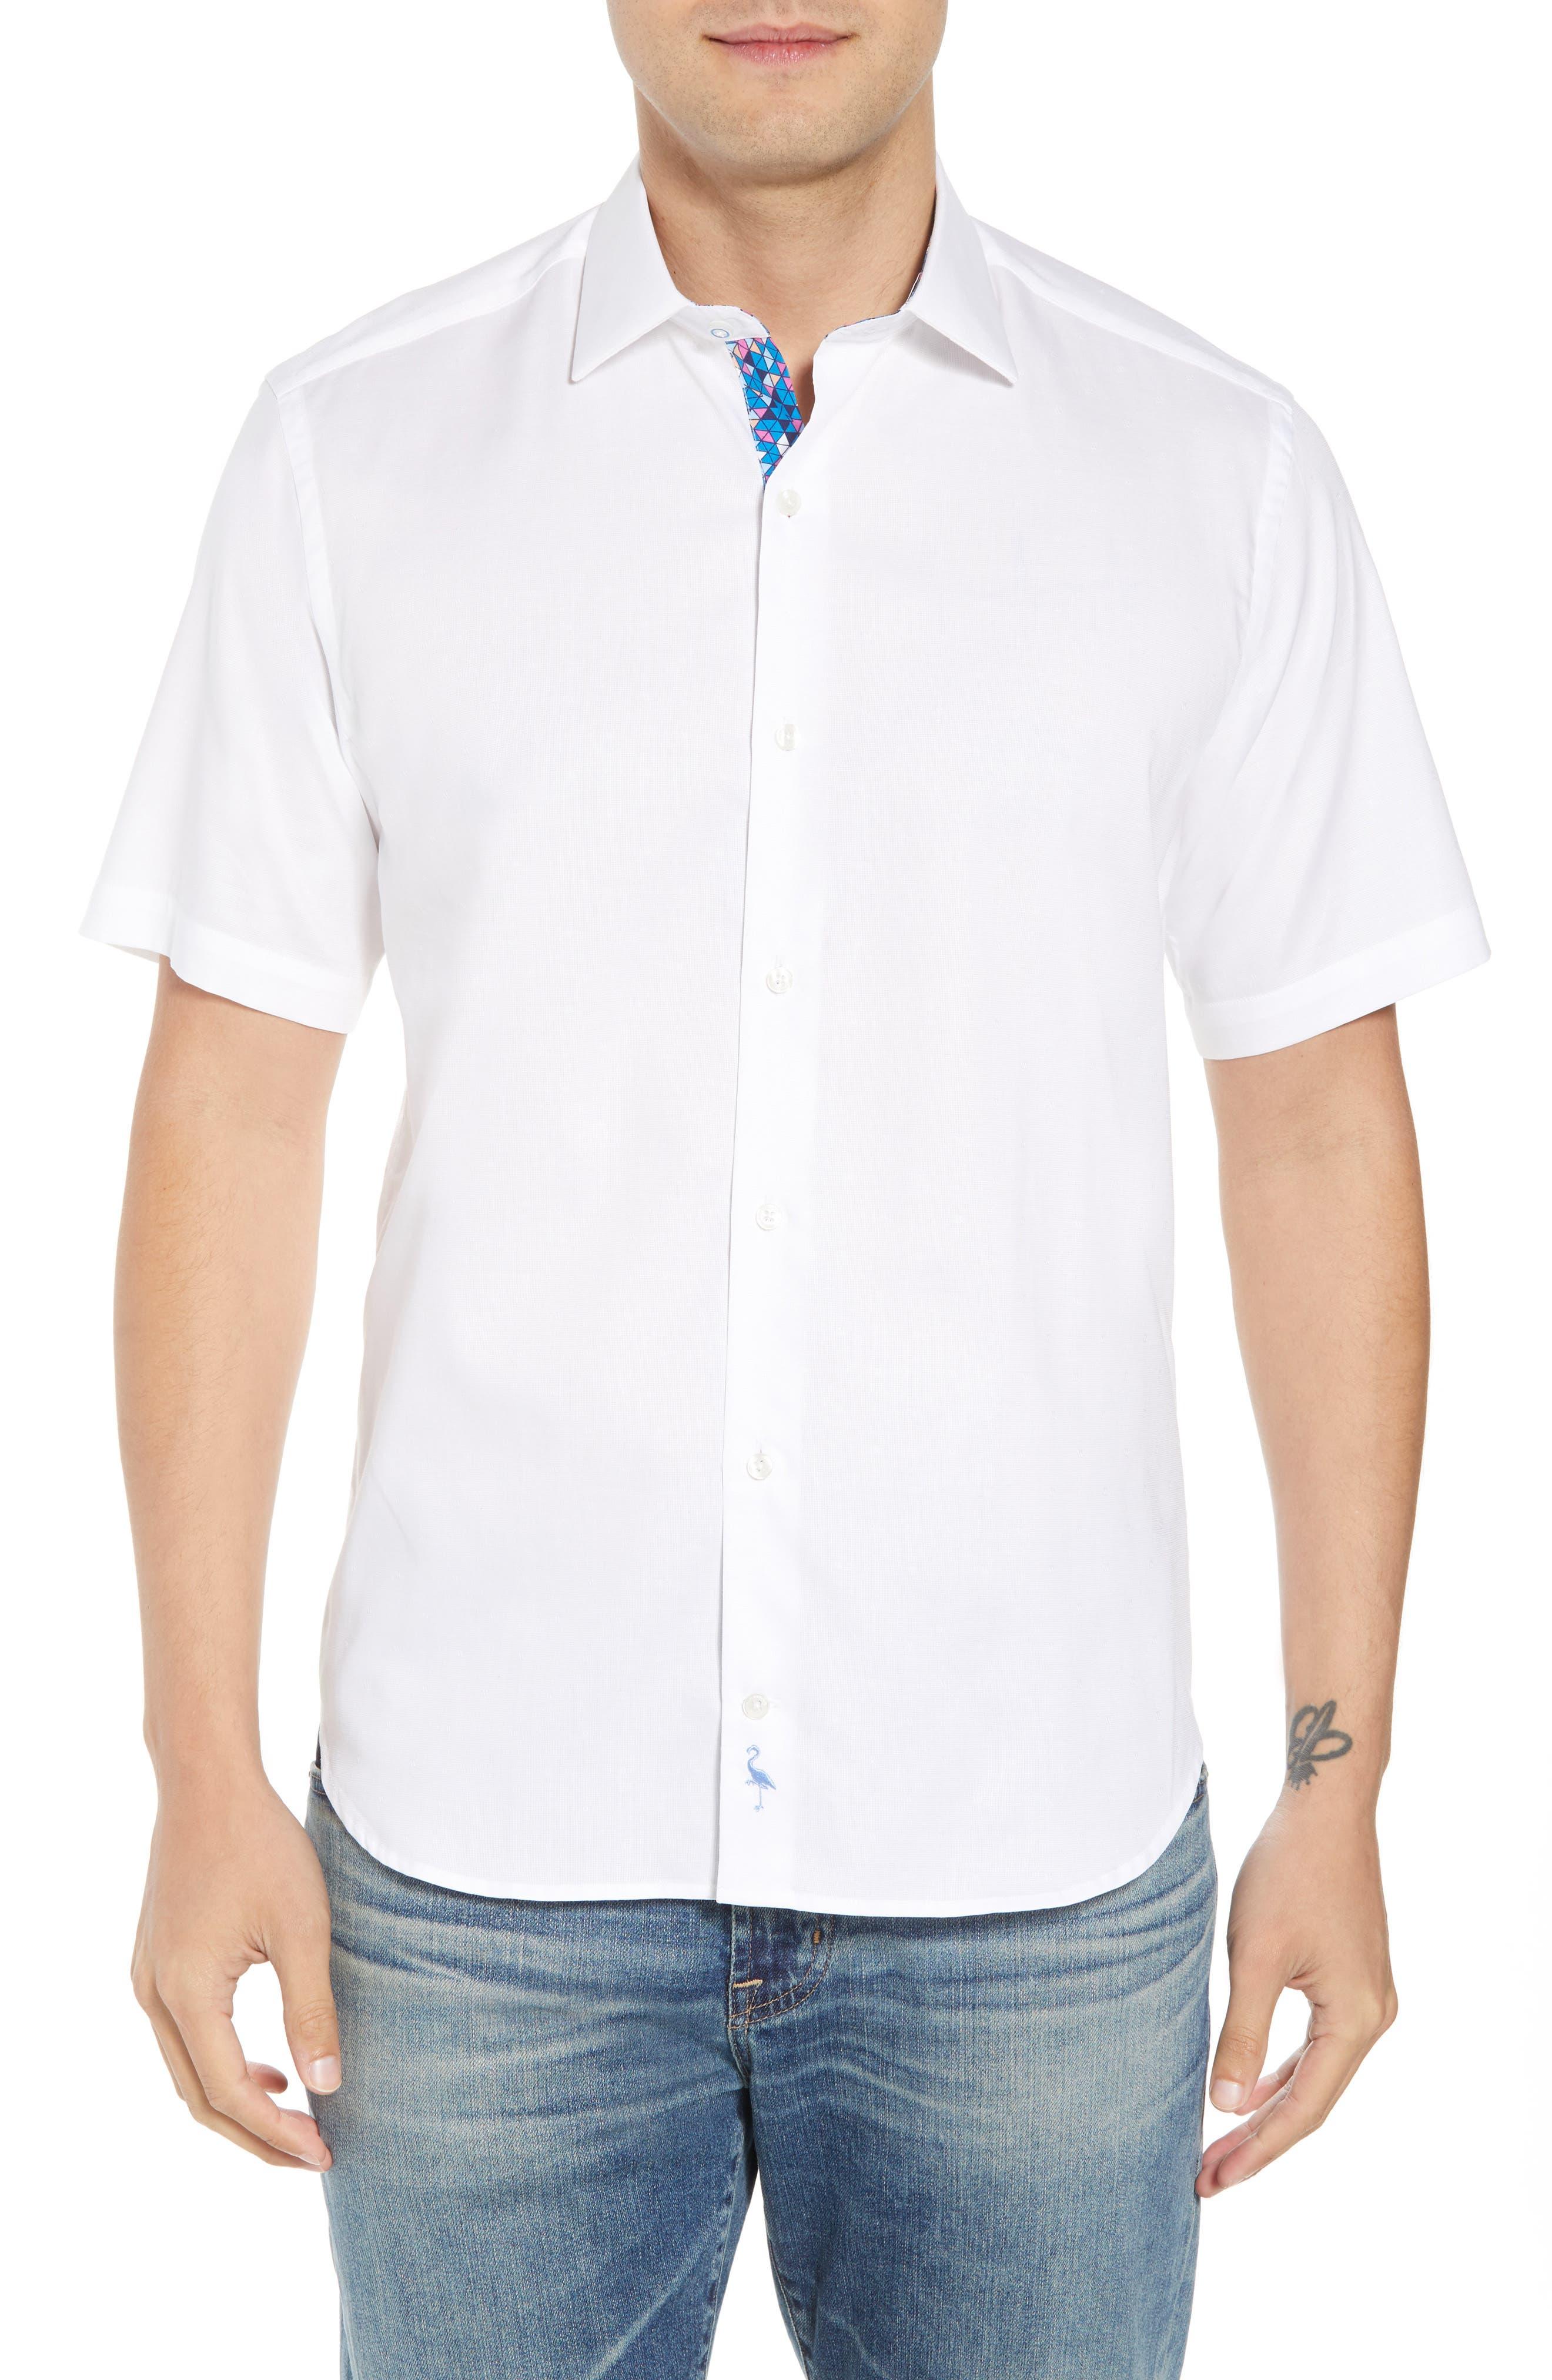 Arlen Regular Fit Sport Shirt,                         Main,                         color, 100